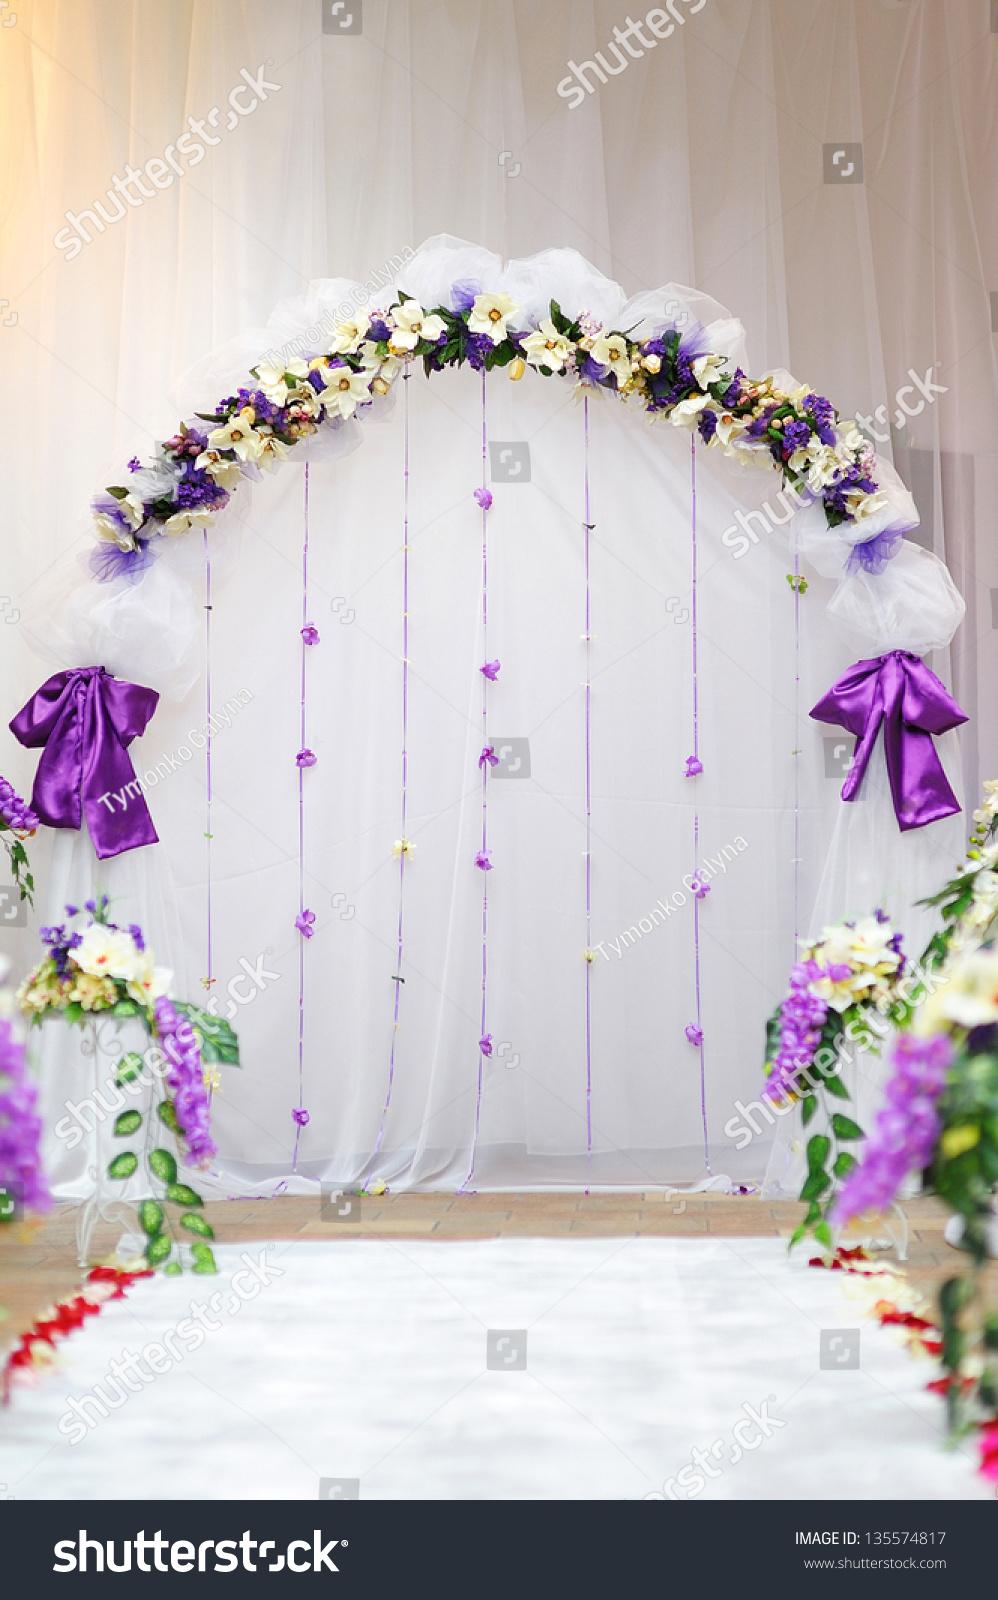 Wedding Arch Purple Decor Stock Photo & Image (Royalty-Free ...